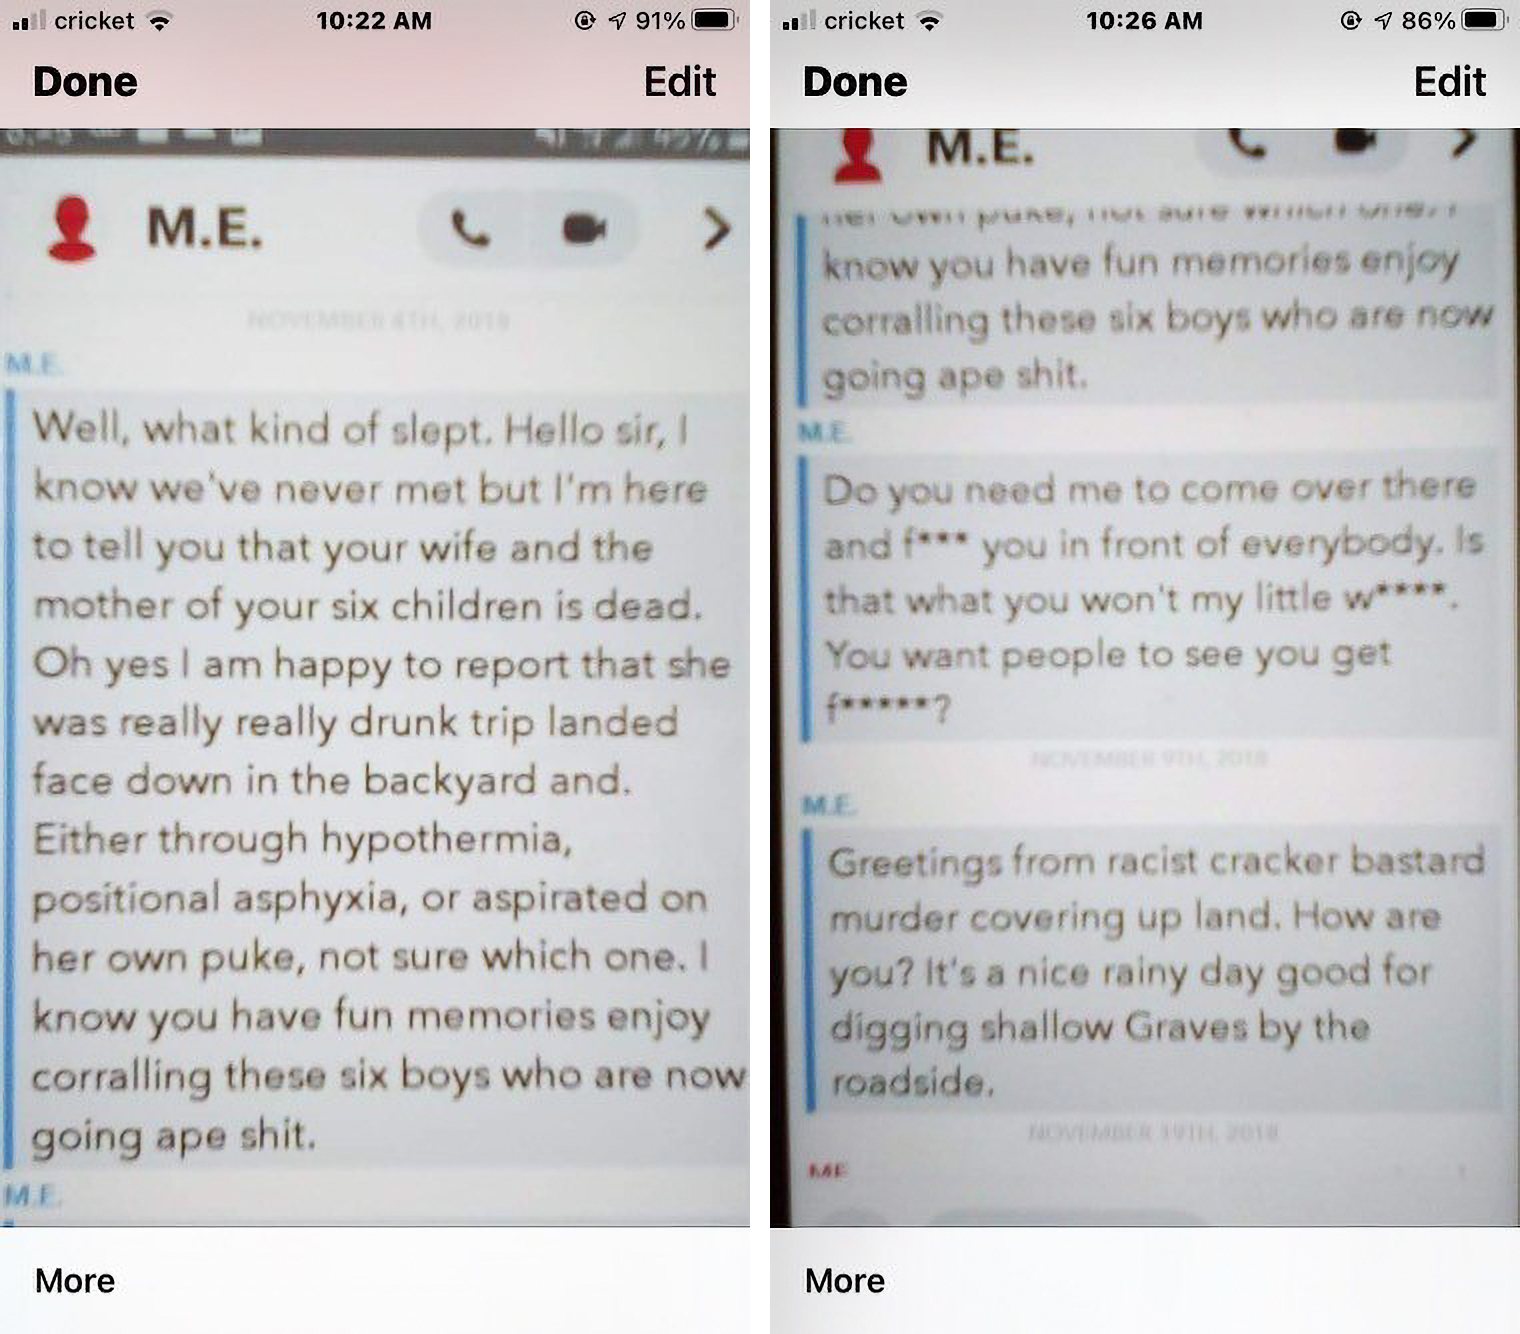 snapchat messages tamla horsford